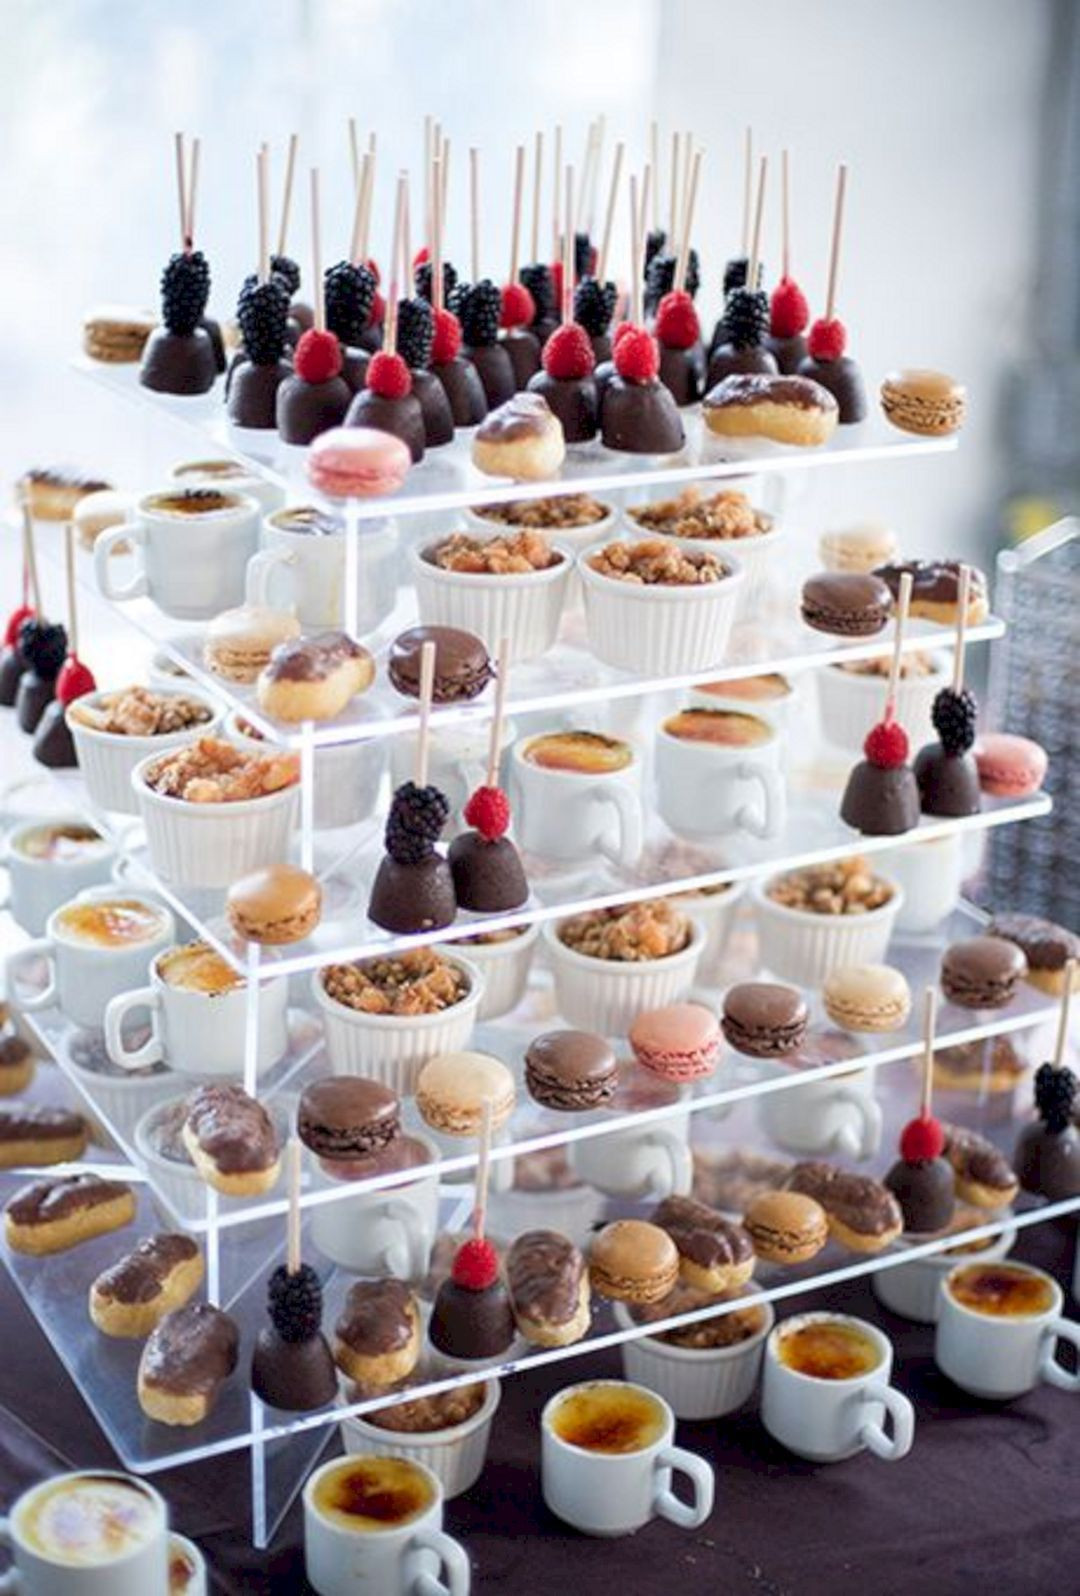 Wedding Dessert Bar Ideas  Wedding Dessert Bar Ideas 115 – OOSILE